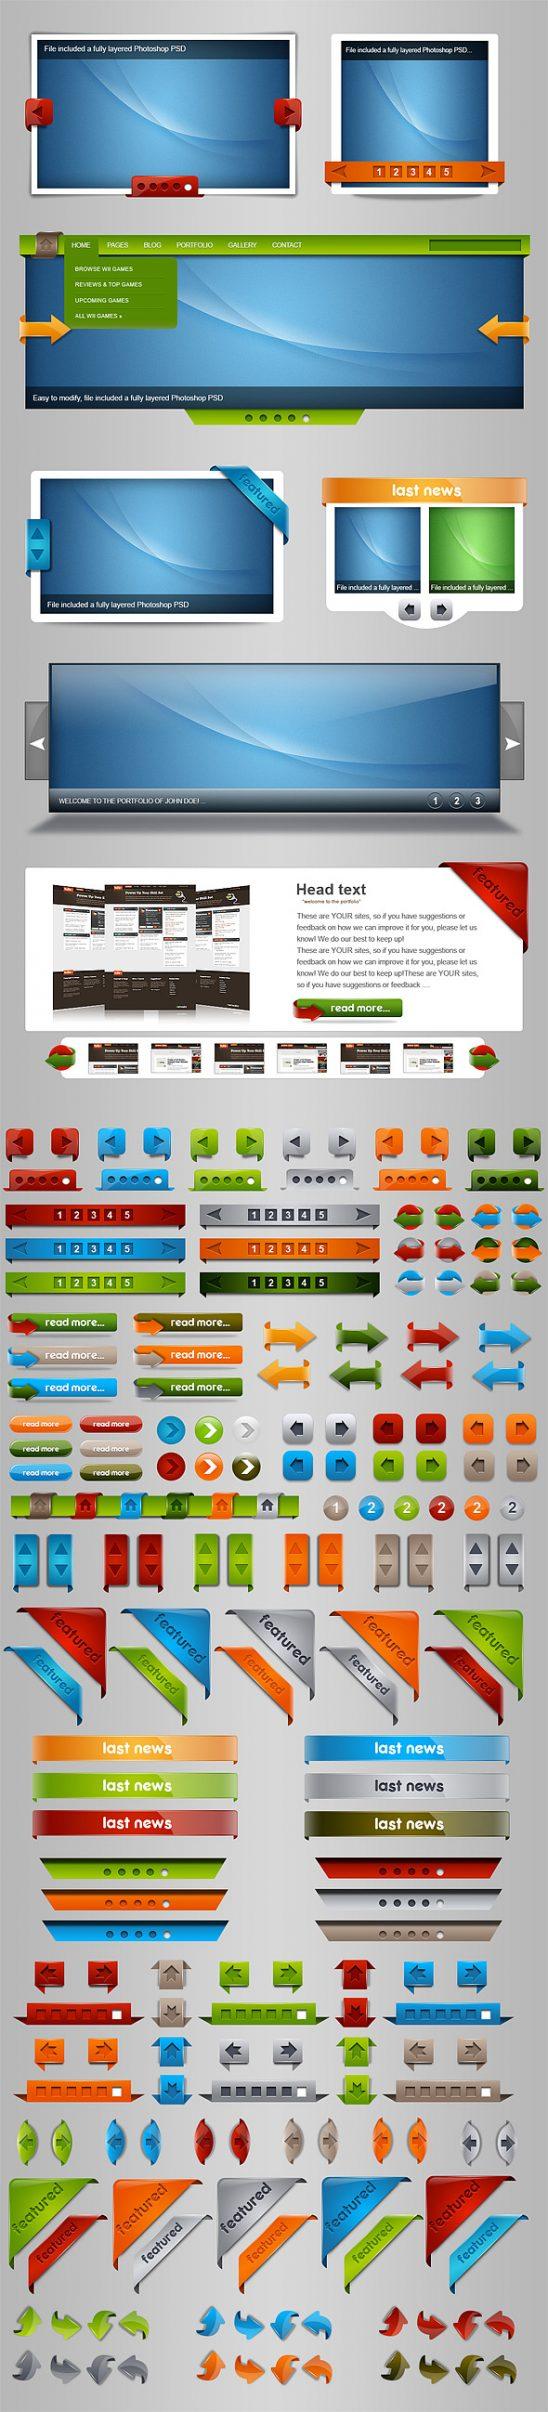 p176 548x2412 - لایه باز اسلاید شوی عکس گالری وب اپلیکیشن با دکمه های گرافیکی